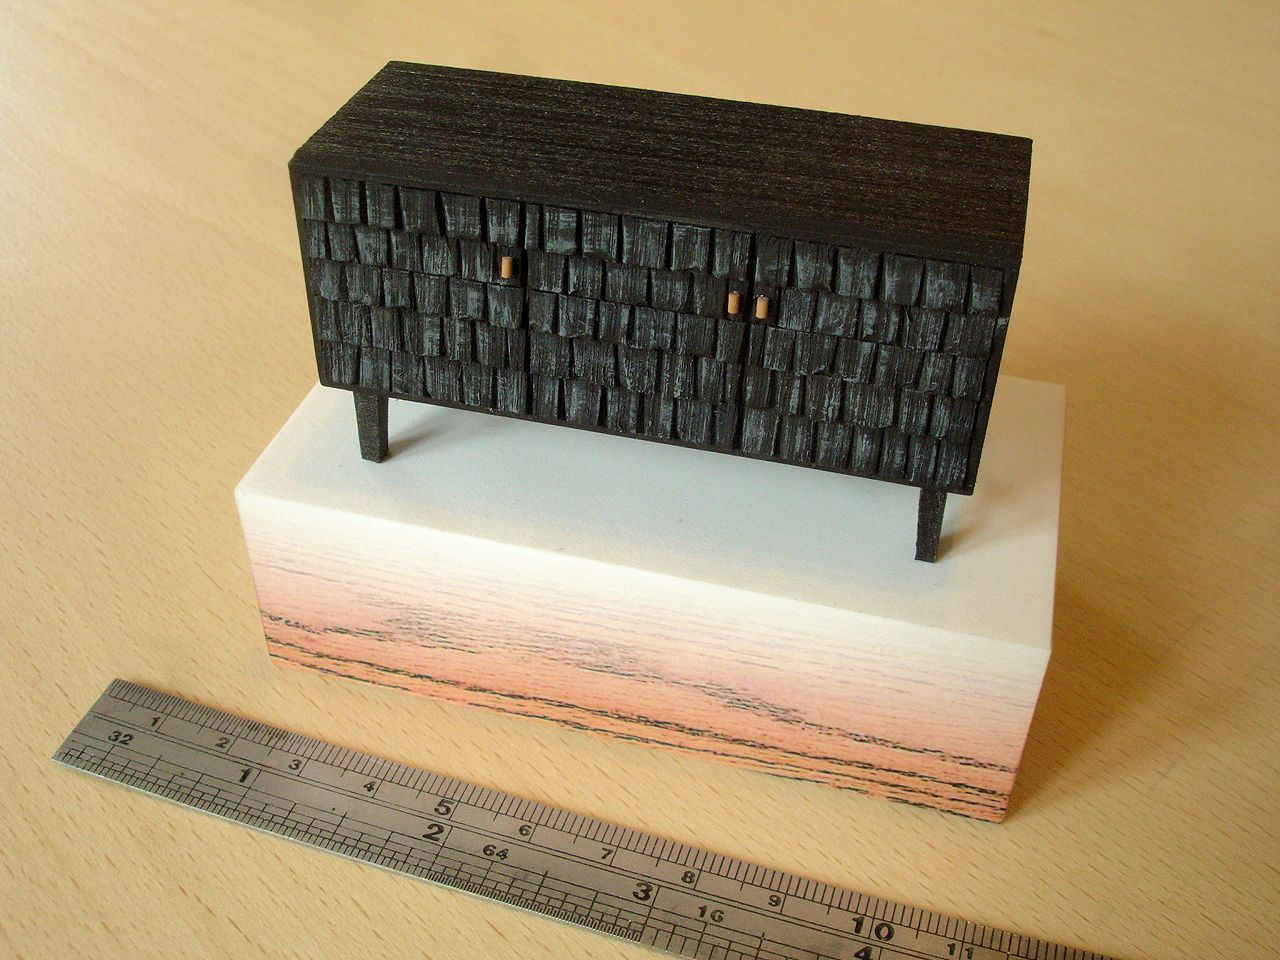 Sebastian Cox 'Scorched Shake Sideboard', model by David Neat